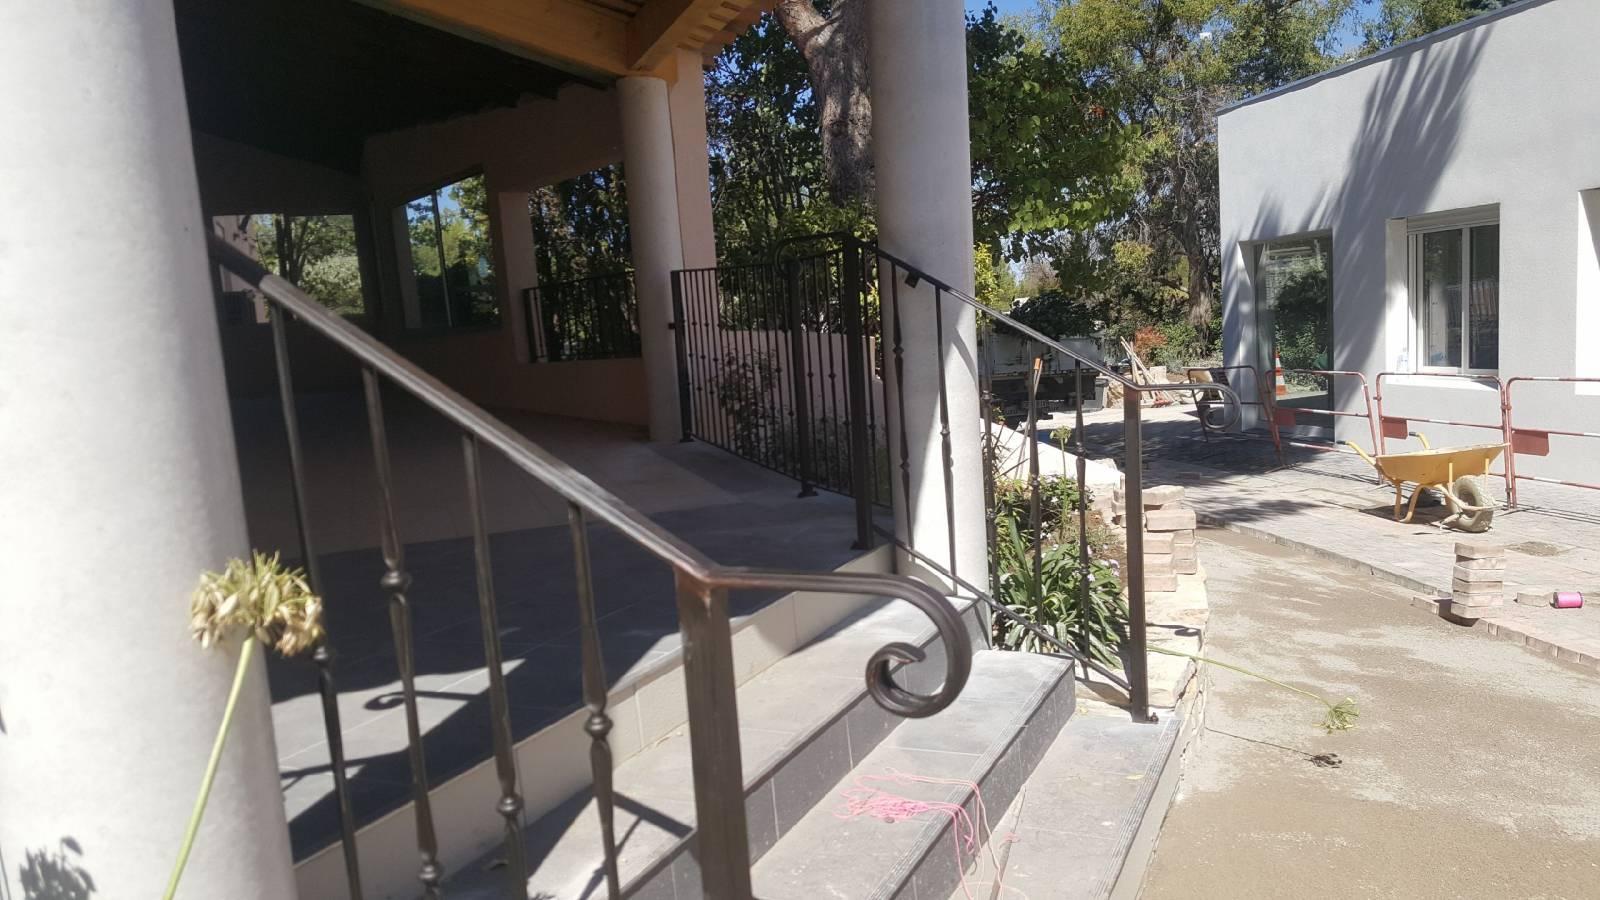 rampe d 39 escalier fer forg secteur marseille ferronnerie. Black Bedroom Furniture Sets. Home Design Ideas